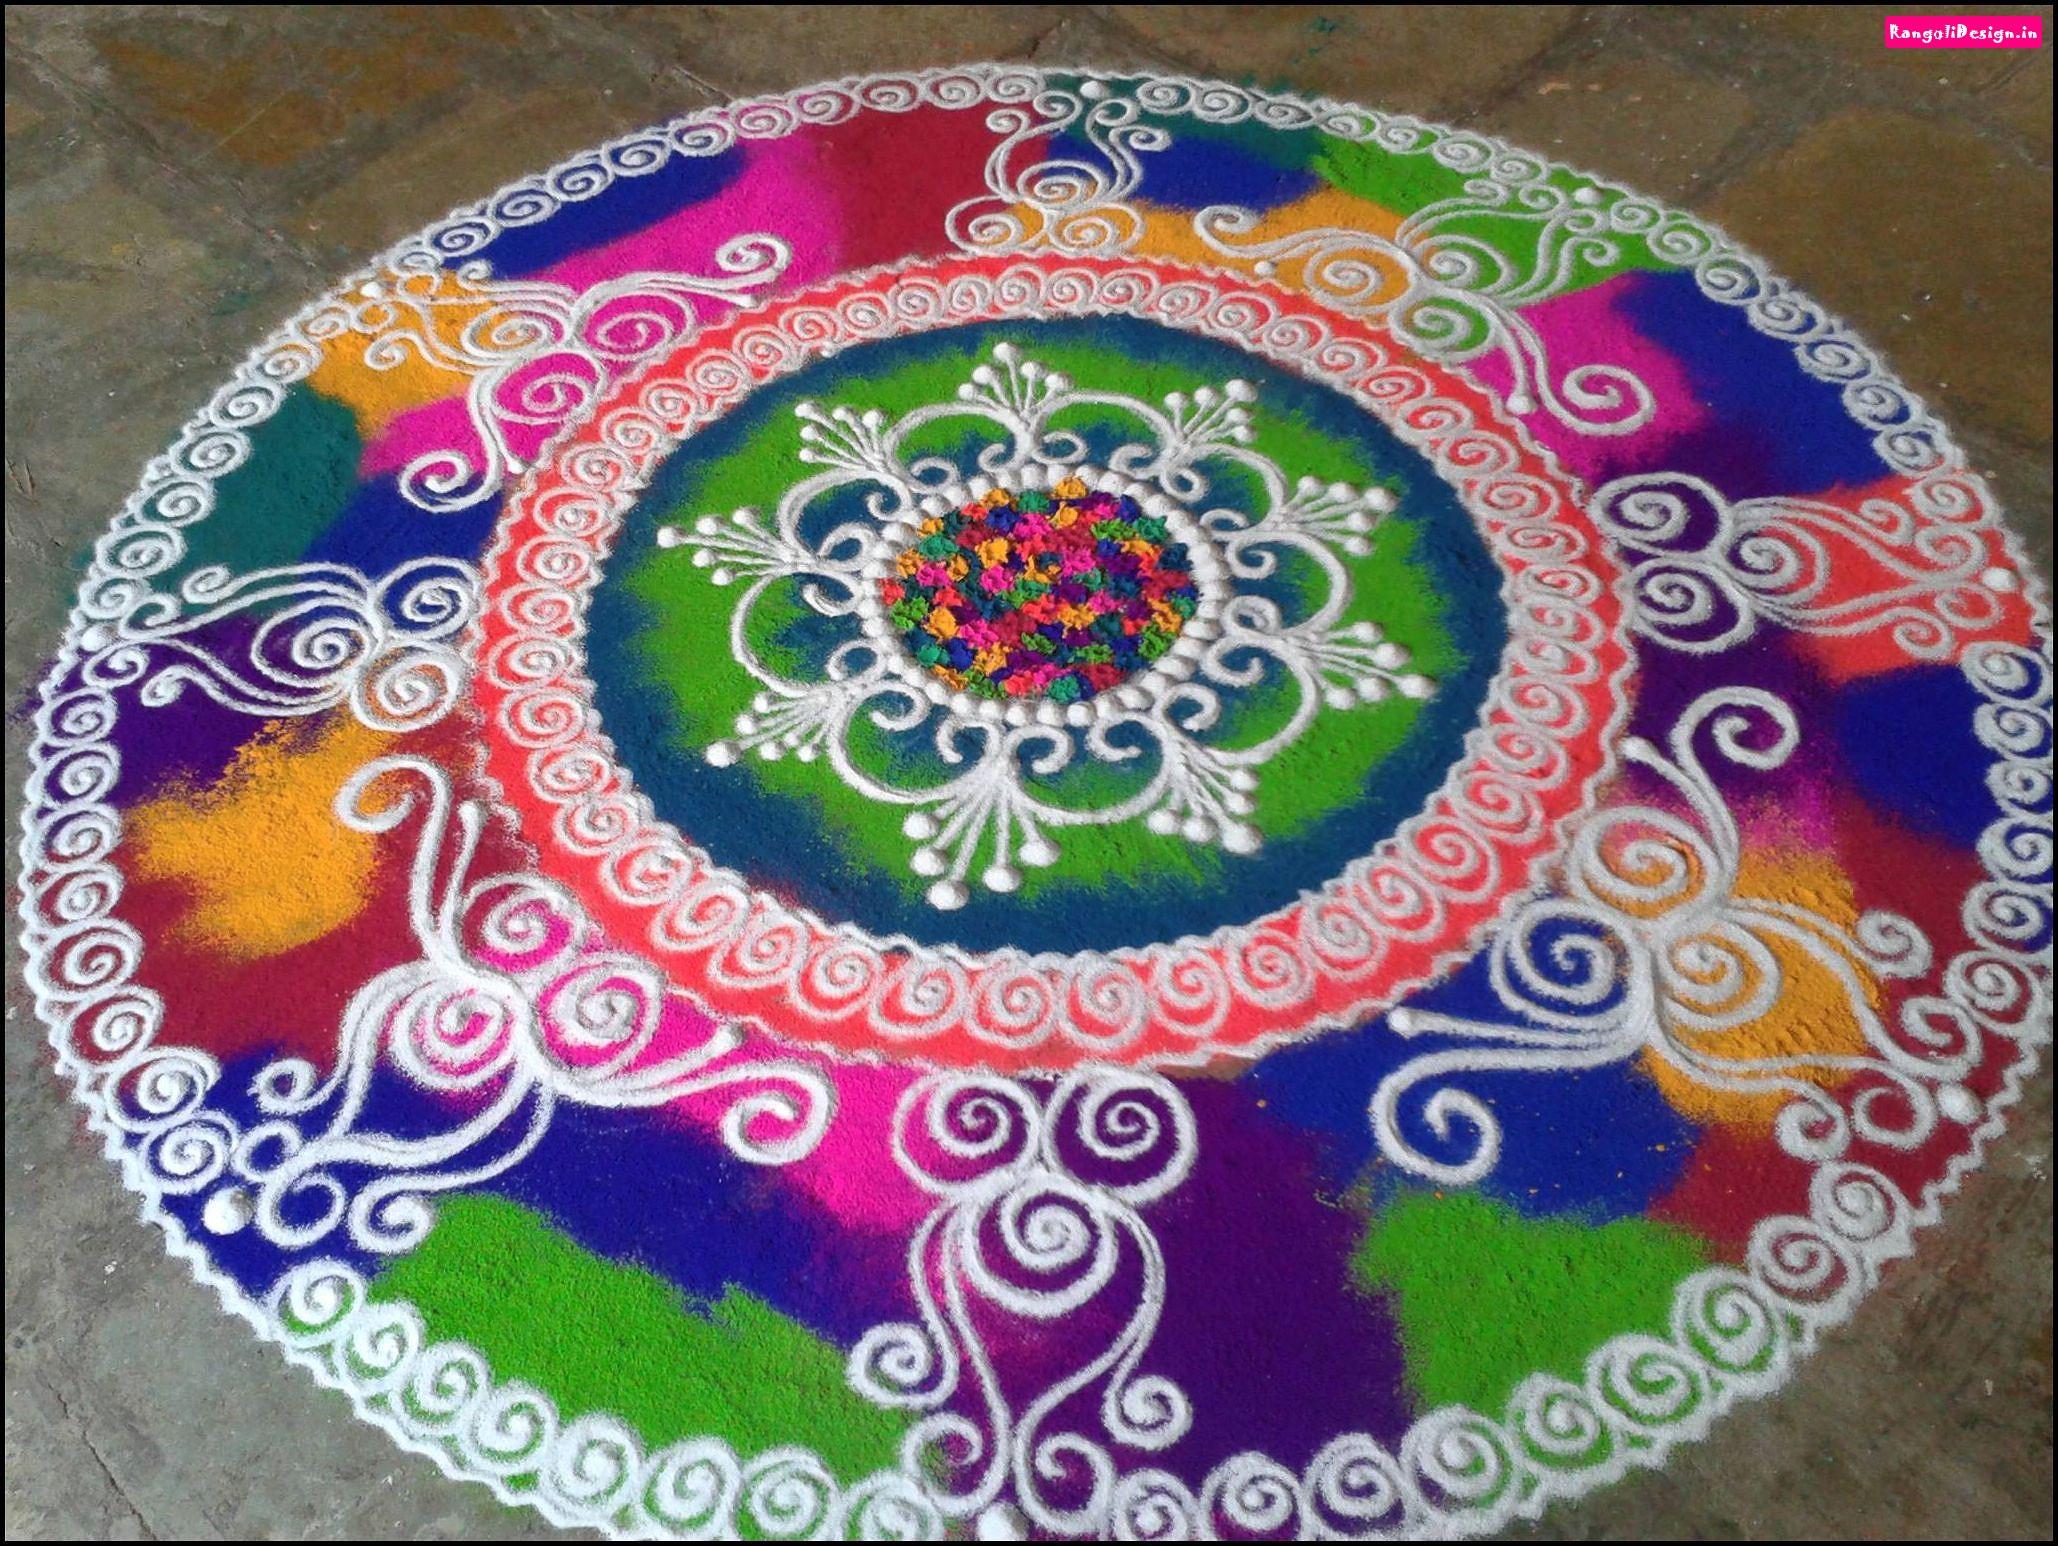 17.Colorful Round Rangoli